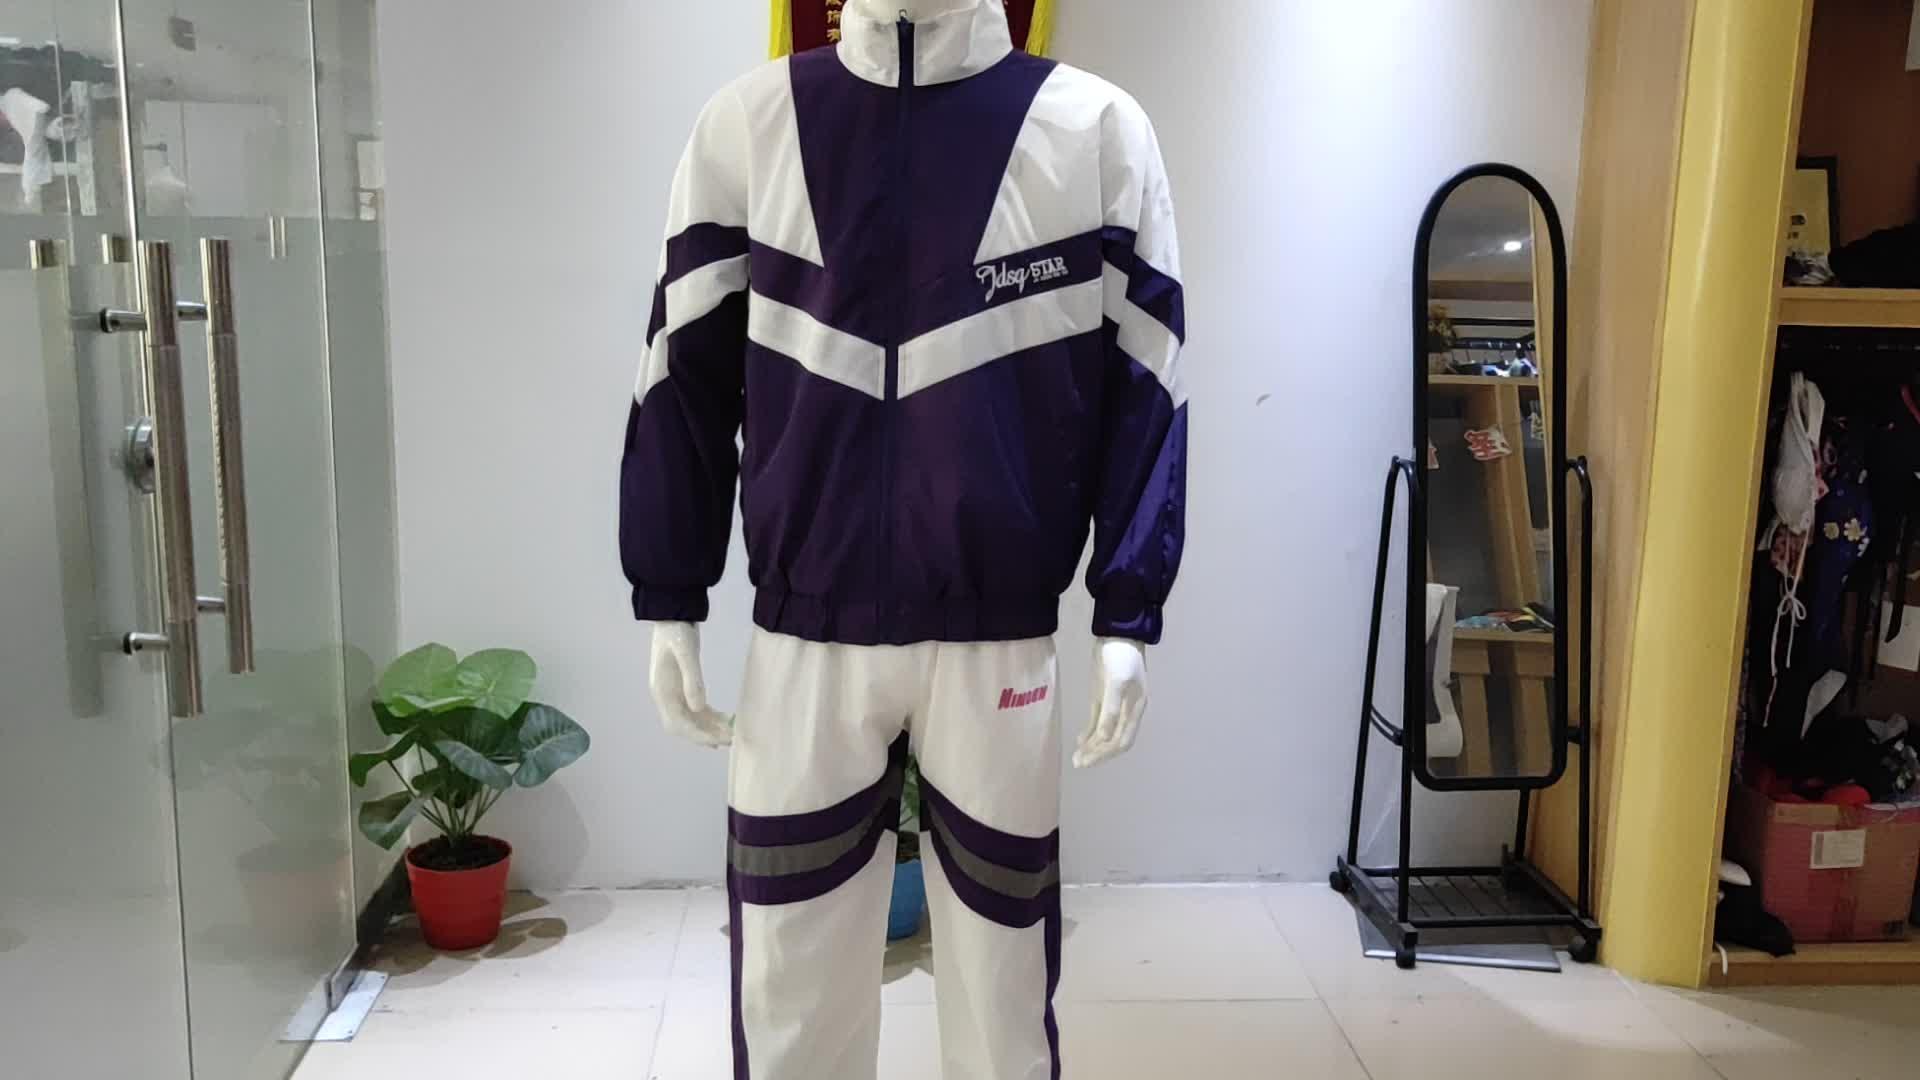 Fabrik wasserdichte nylon leichte trainingsanzug herren windbreaker jogging track anzug set sportswear